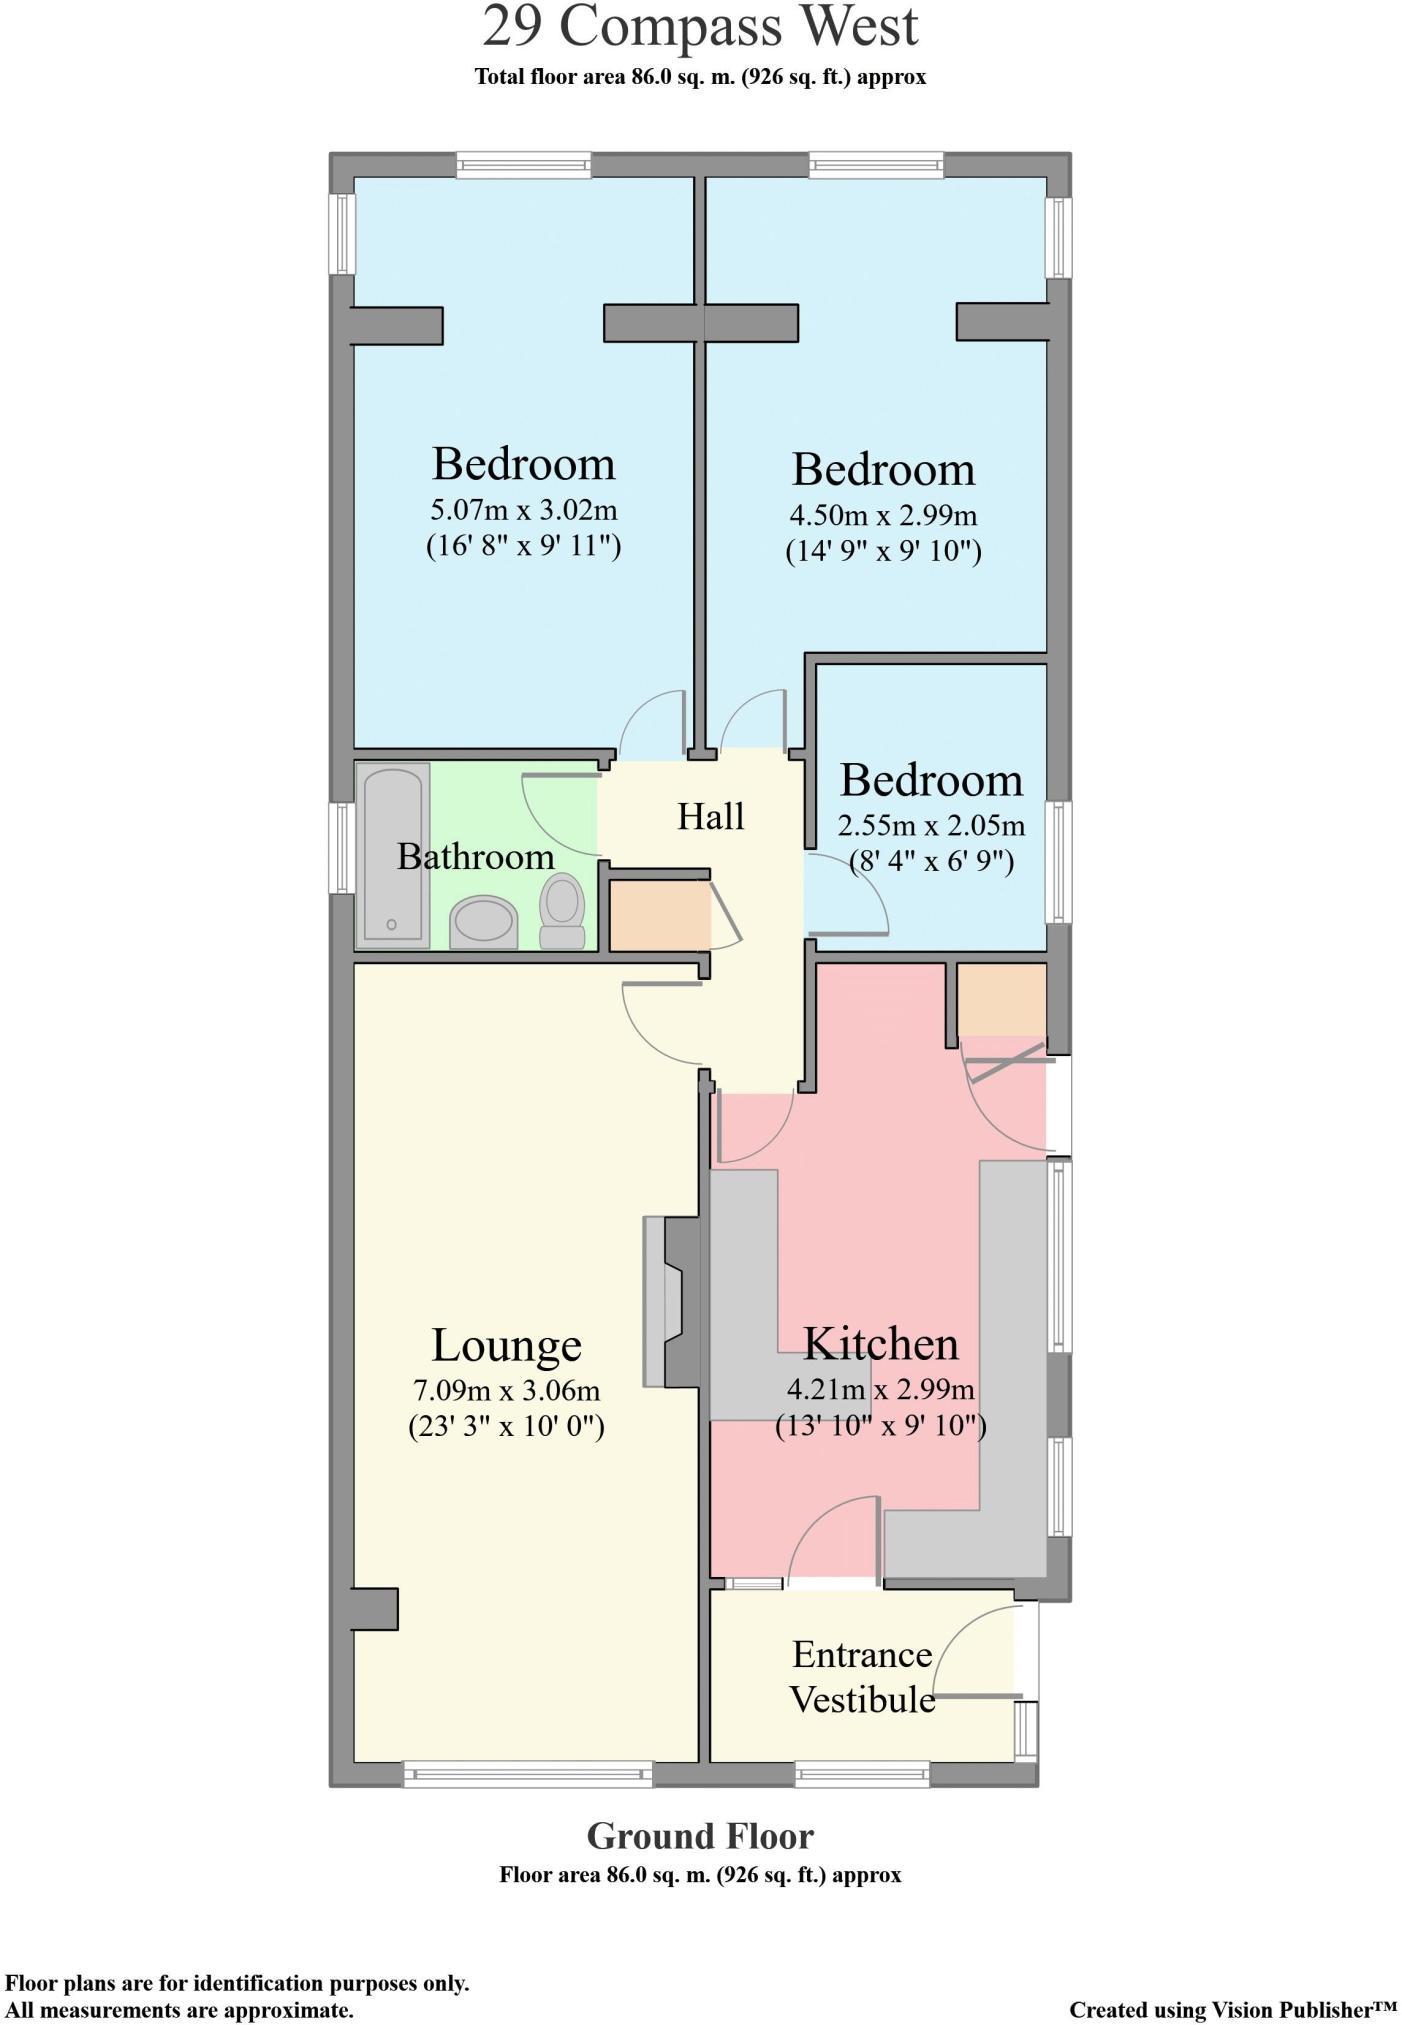 3 bedroom bungalow for sale in Compass West, Tregadillett